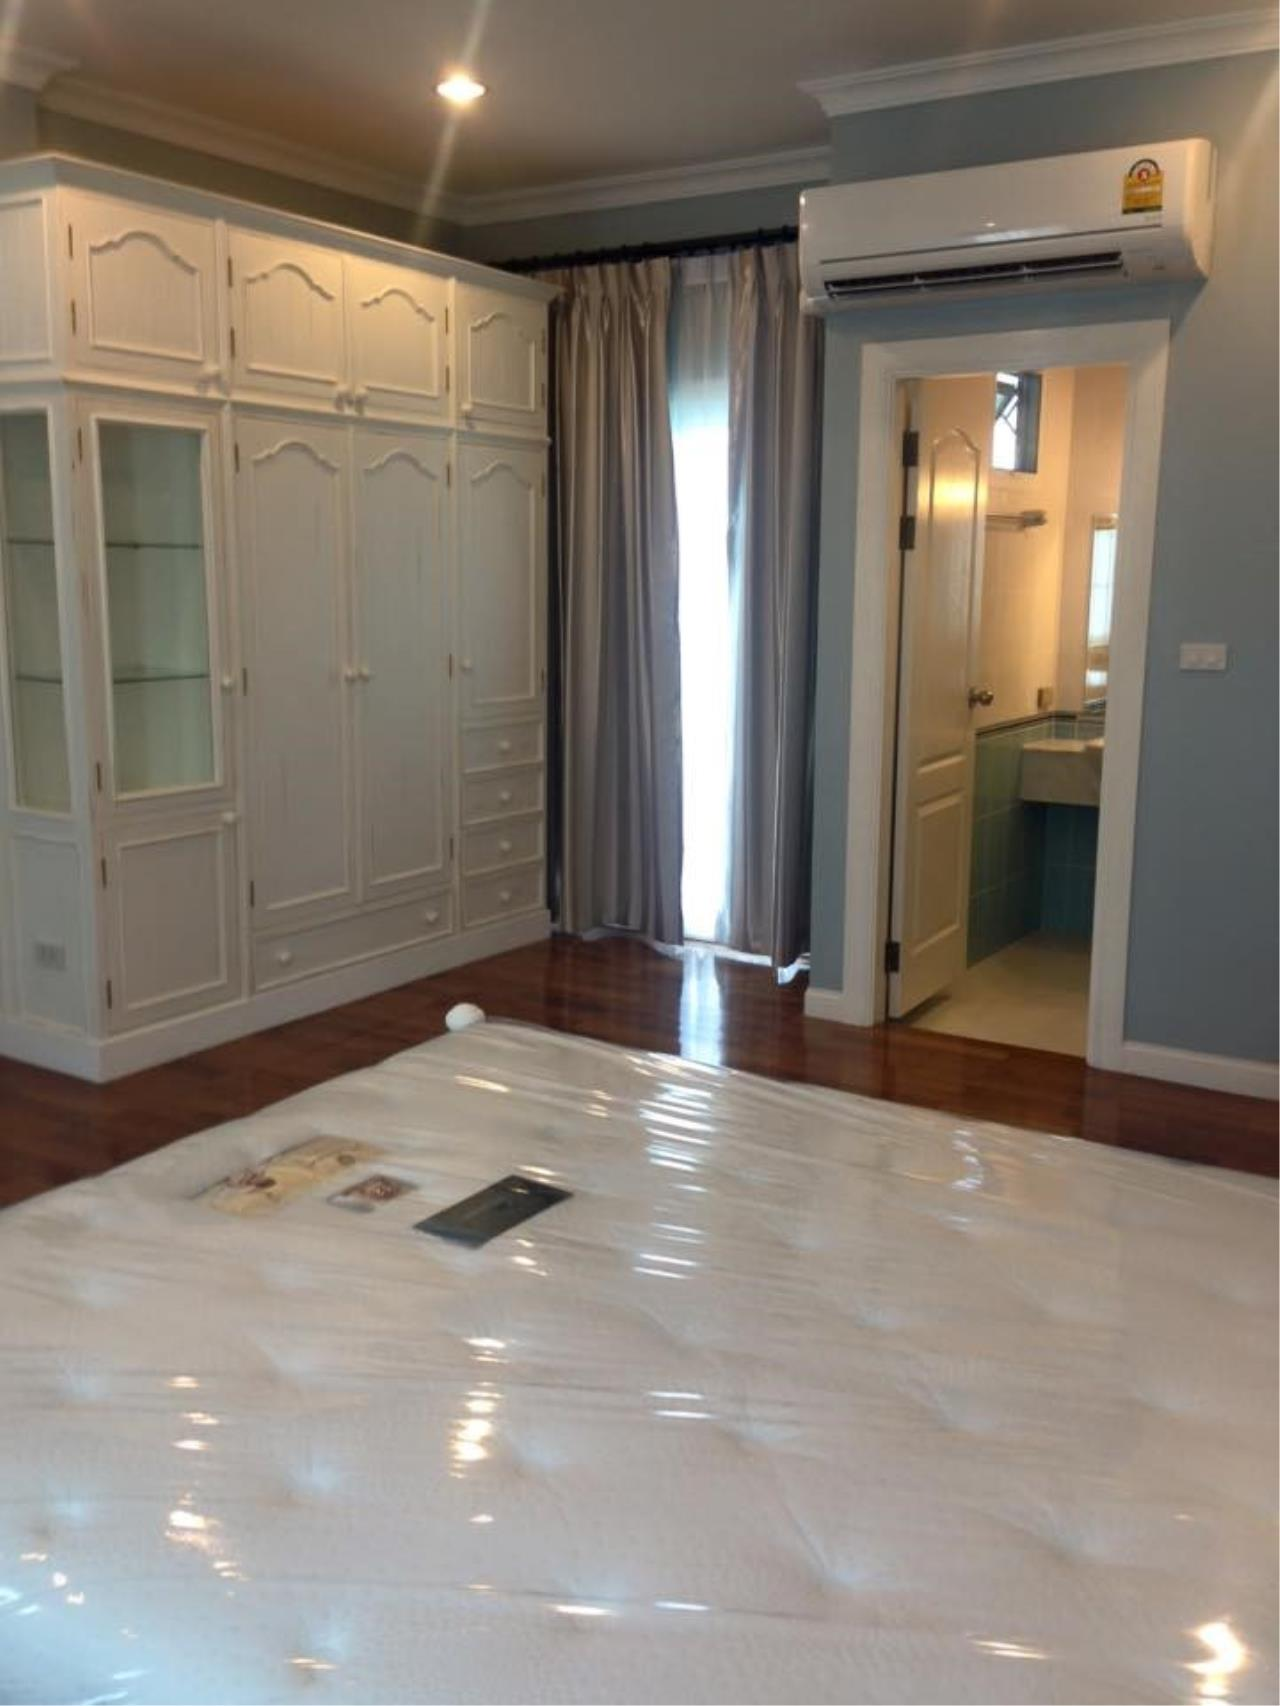 Piri Property Agency's 3 Plus 1 Bedroom Single House for Rent - Fantasia Villa 7